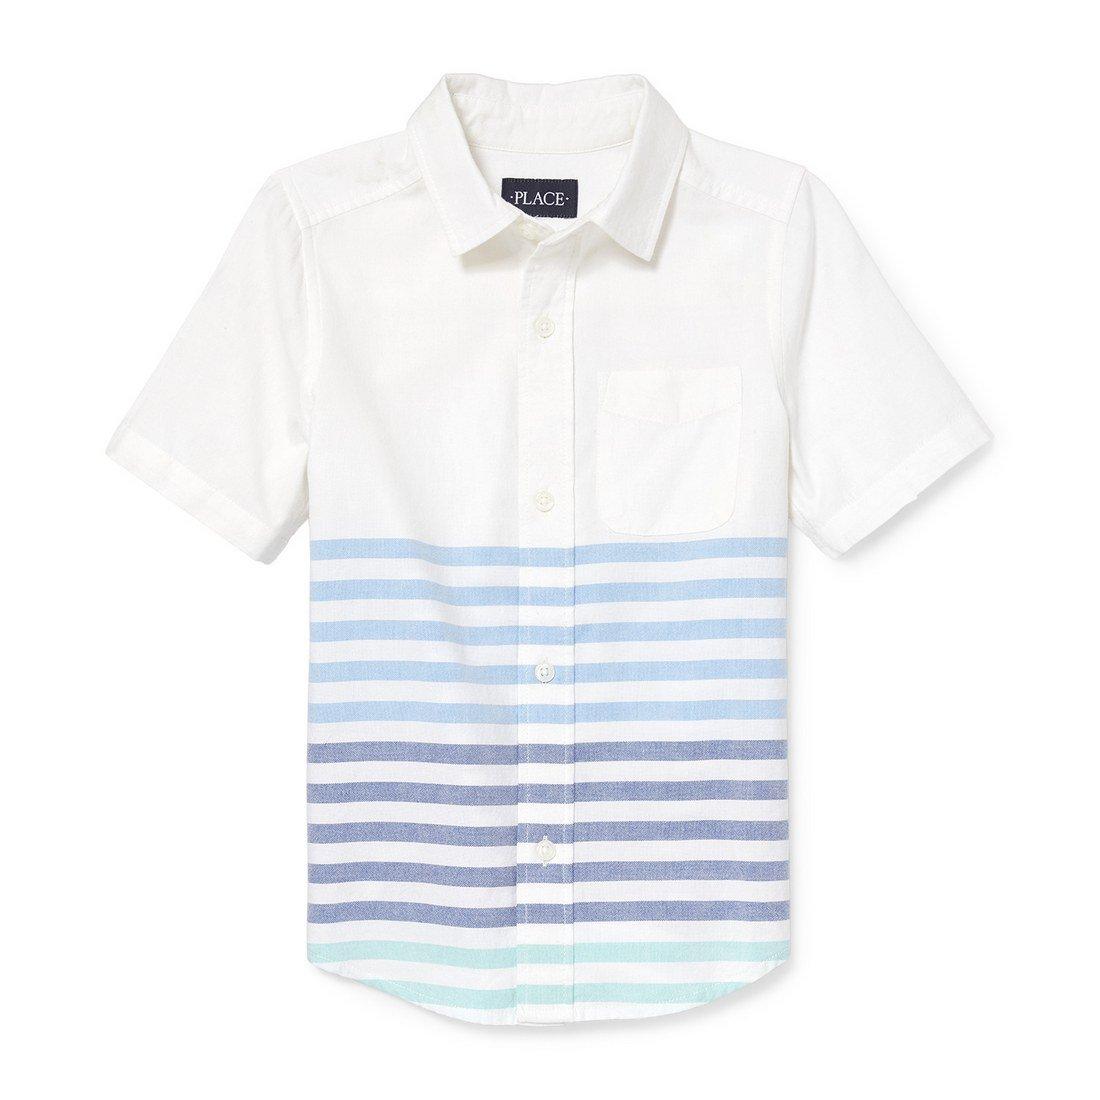 The Children's Place Boys' Short Sleeve Uniform Oxford Shirt, The Children' s Place